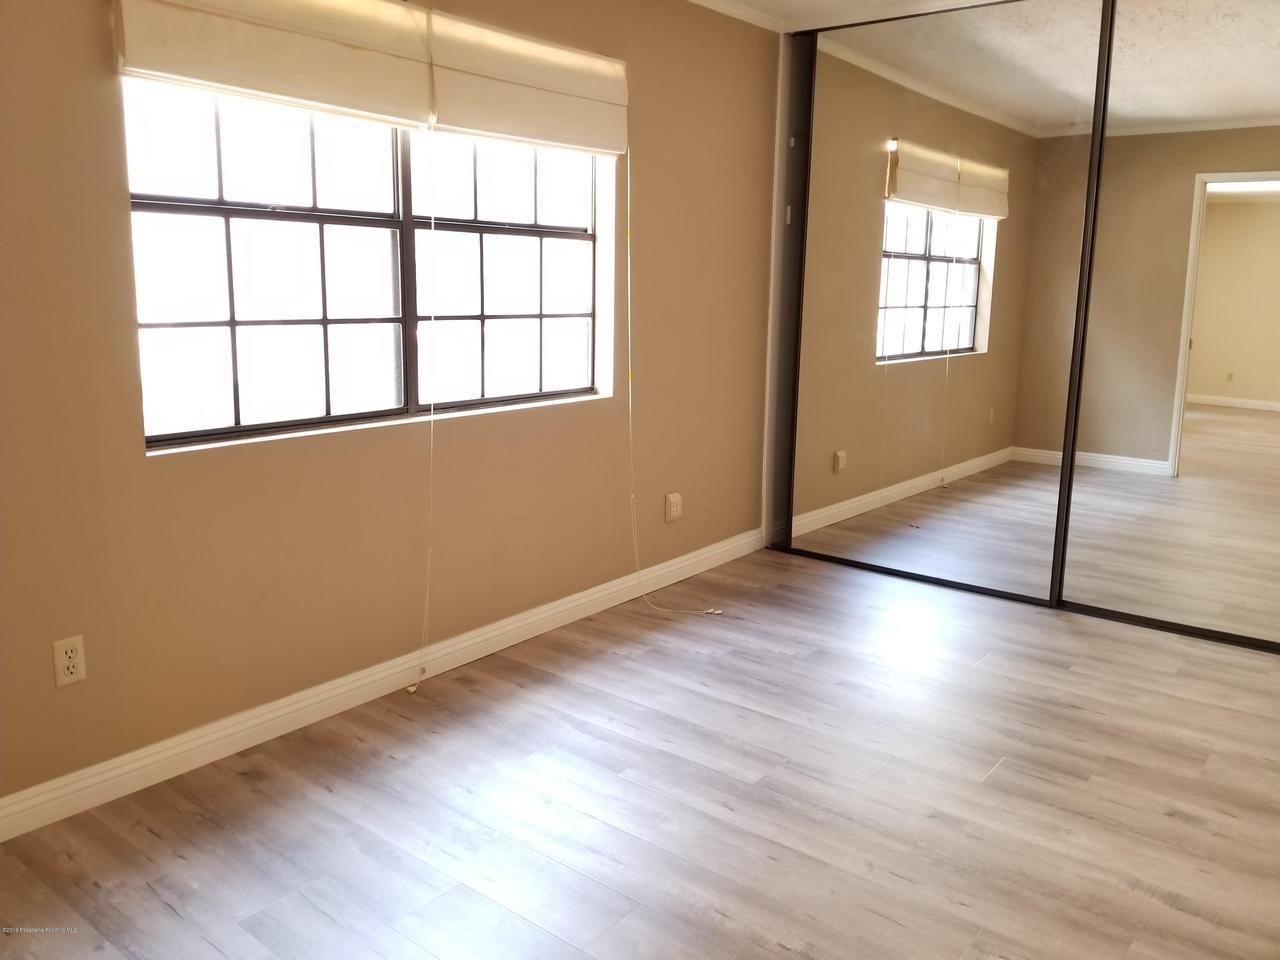 124 MONTEREY, South Pasadena, CA 91030 - Bedroom 2 window